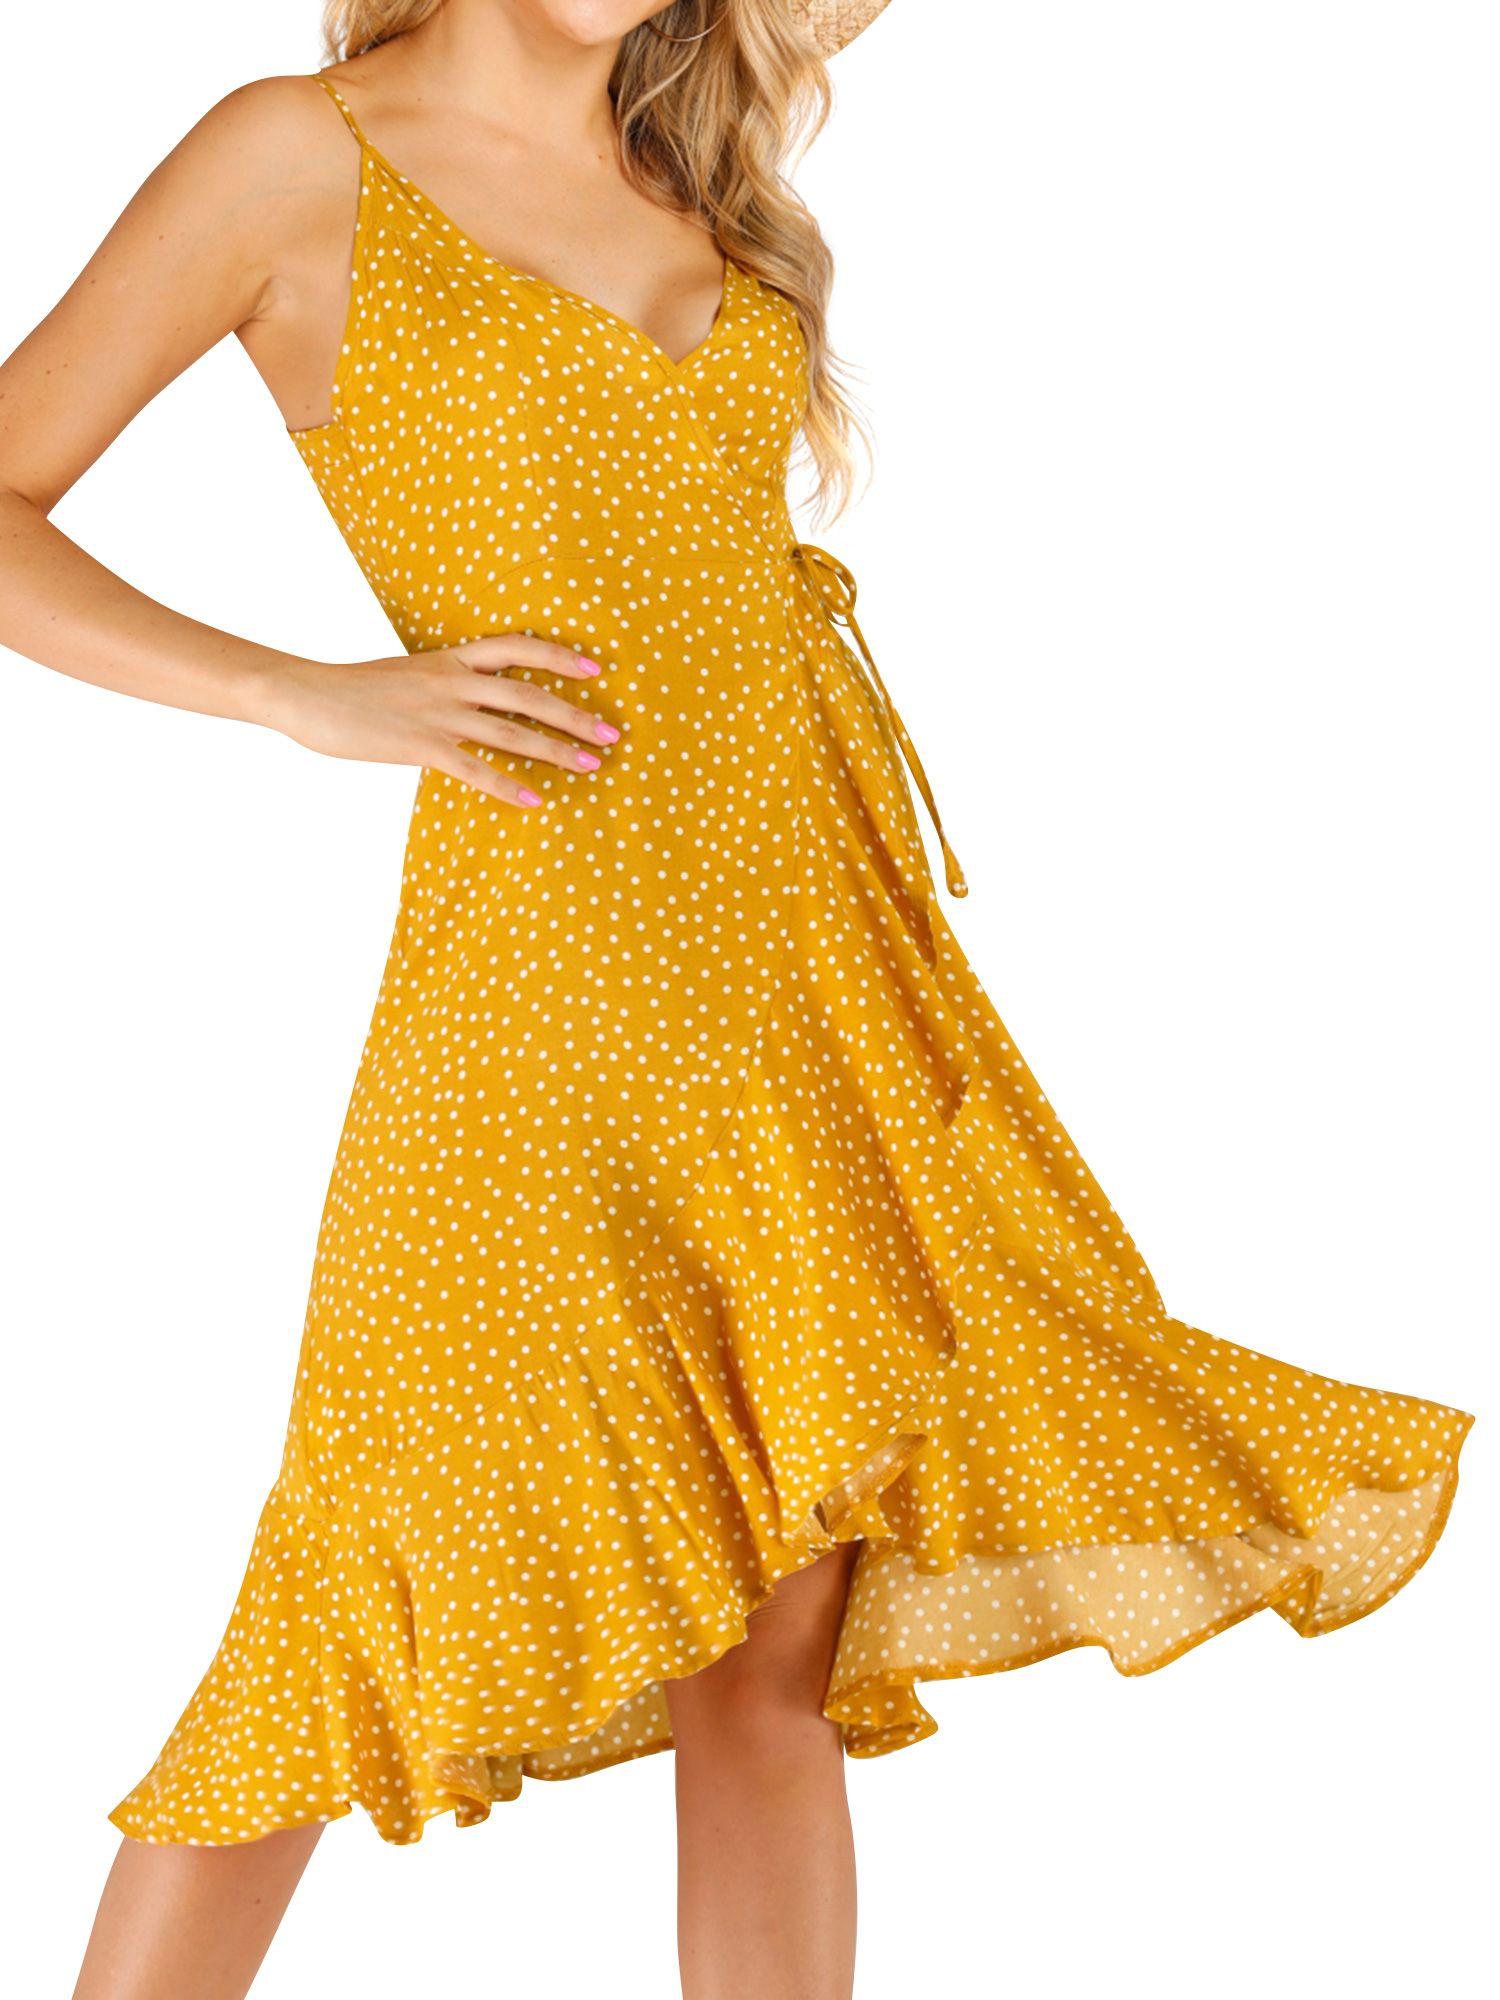 Nlife Women V Neck Polka Dots Ruffle Tie Waist Asymmetric Hem Midi Dress Walmart Com Yellow Midi Dress Ruffle Midi Dress Womens Midi Dresses [ 2000 x 1500 Pixel ]